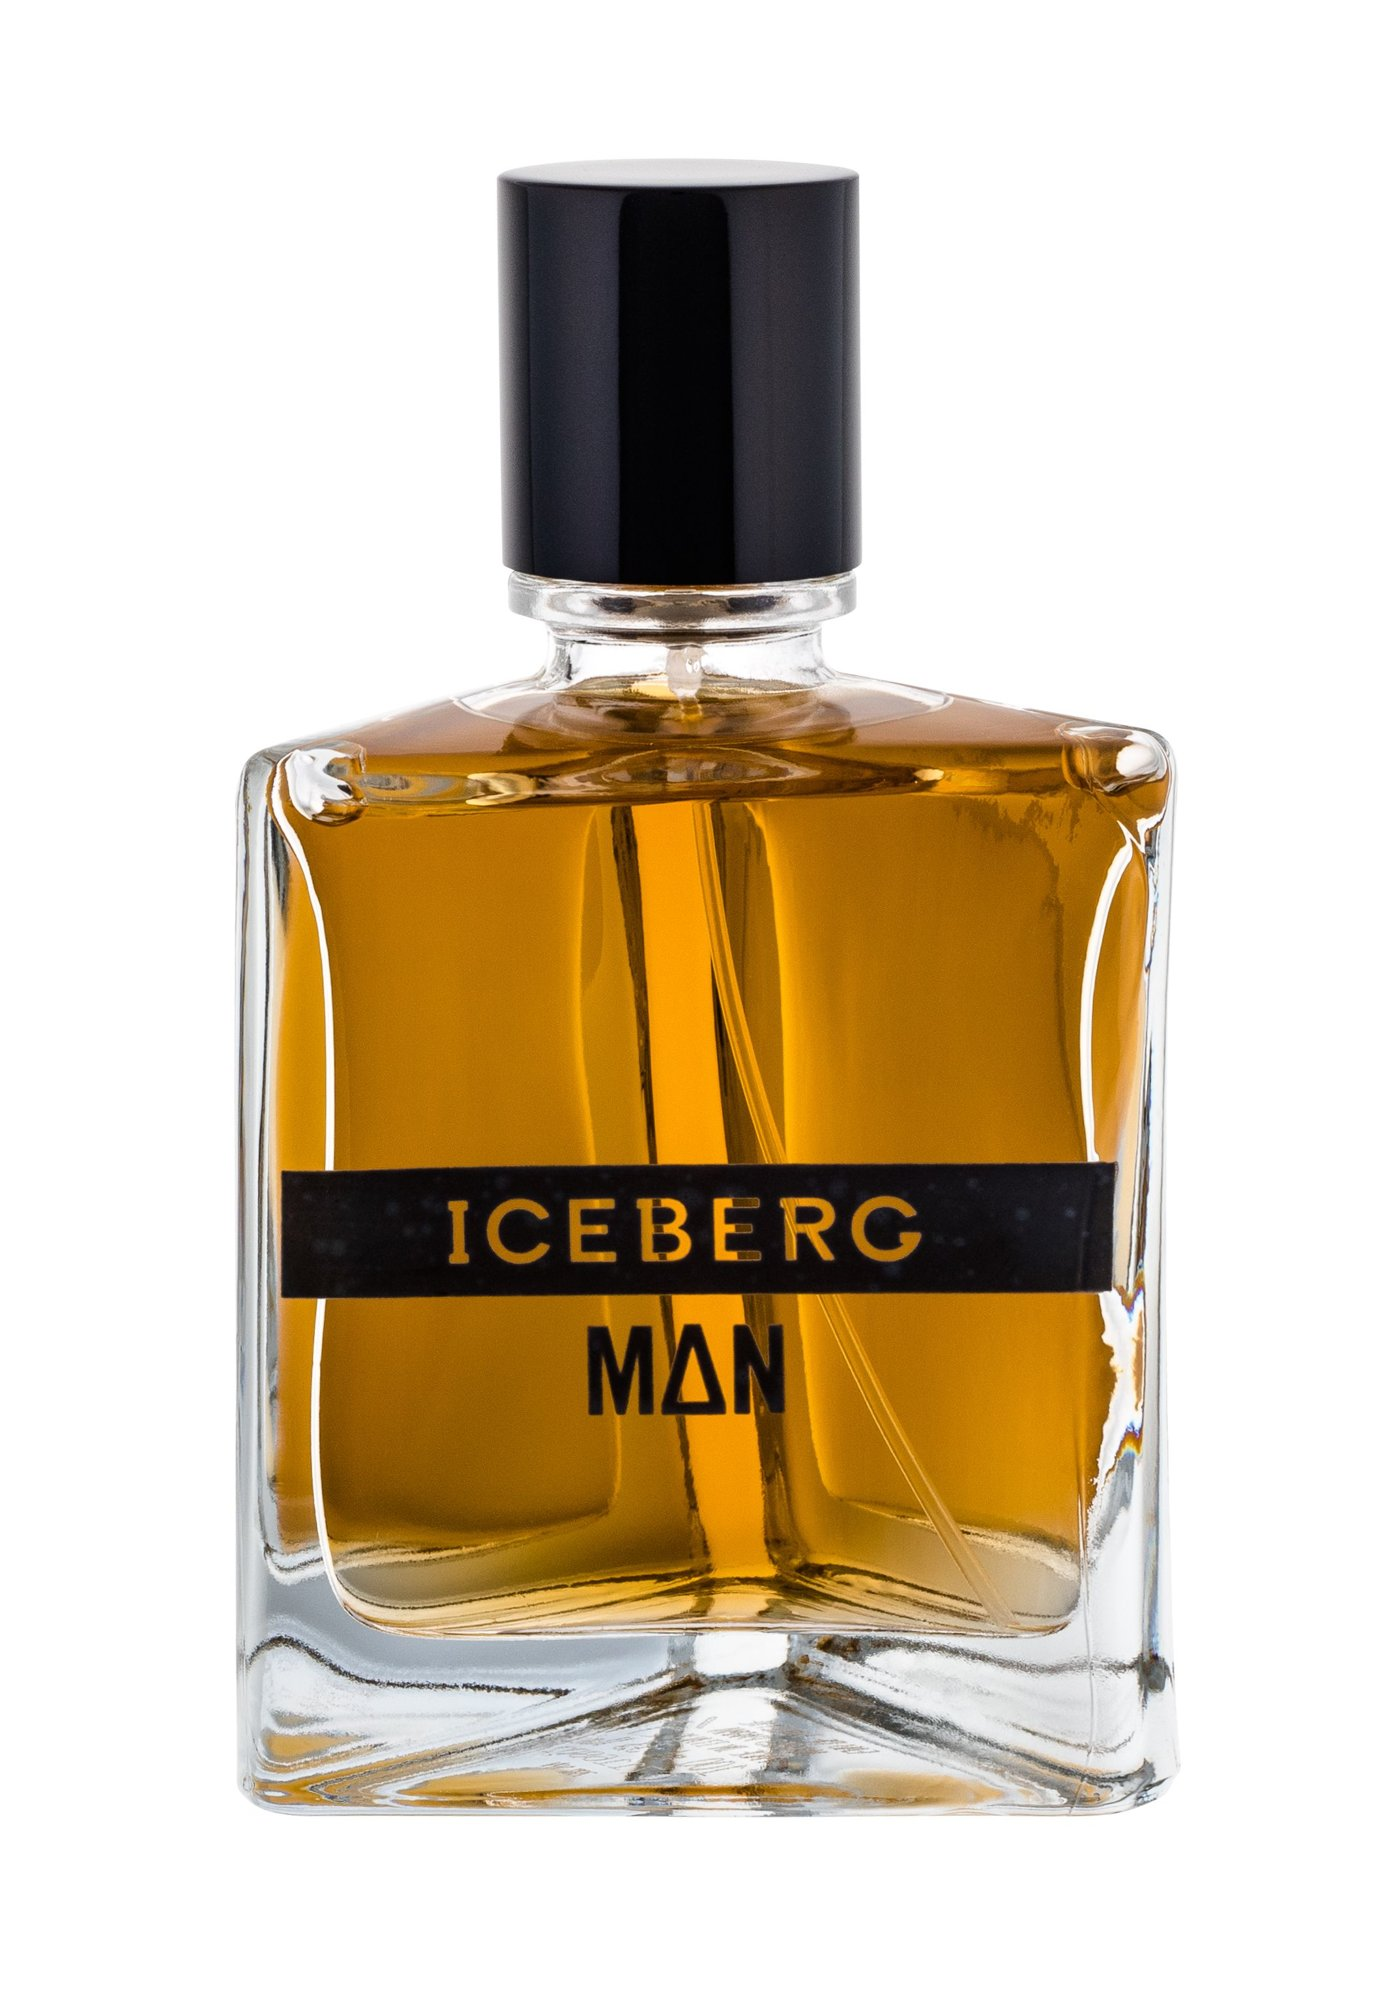 Iceberg Iceberg Man Eau de Toilette 100ml